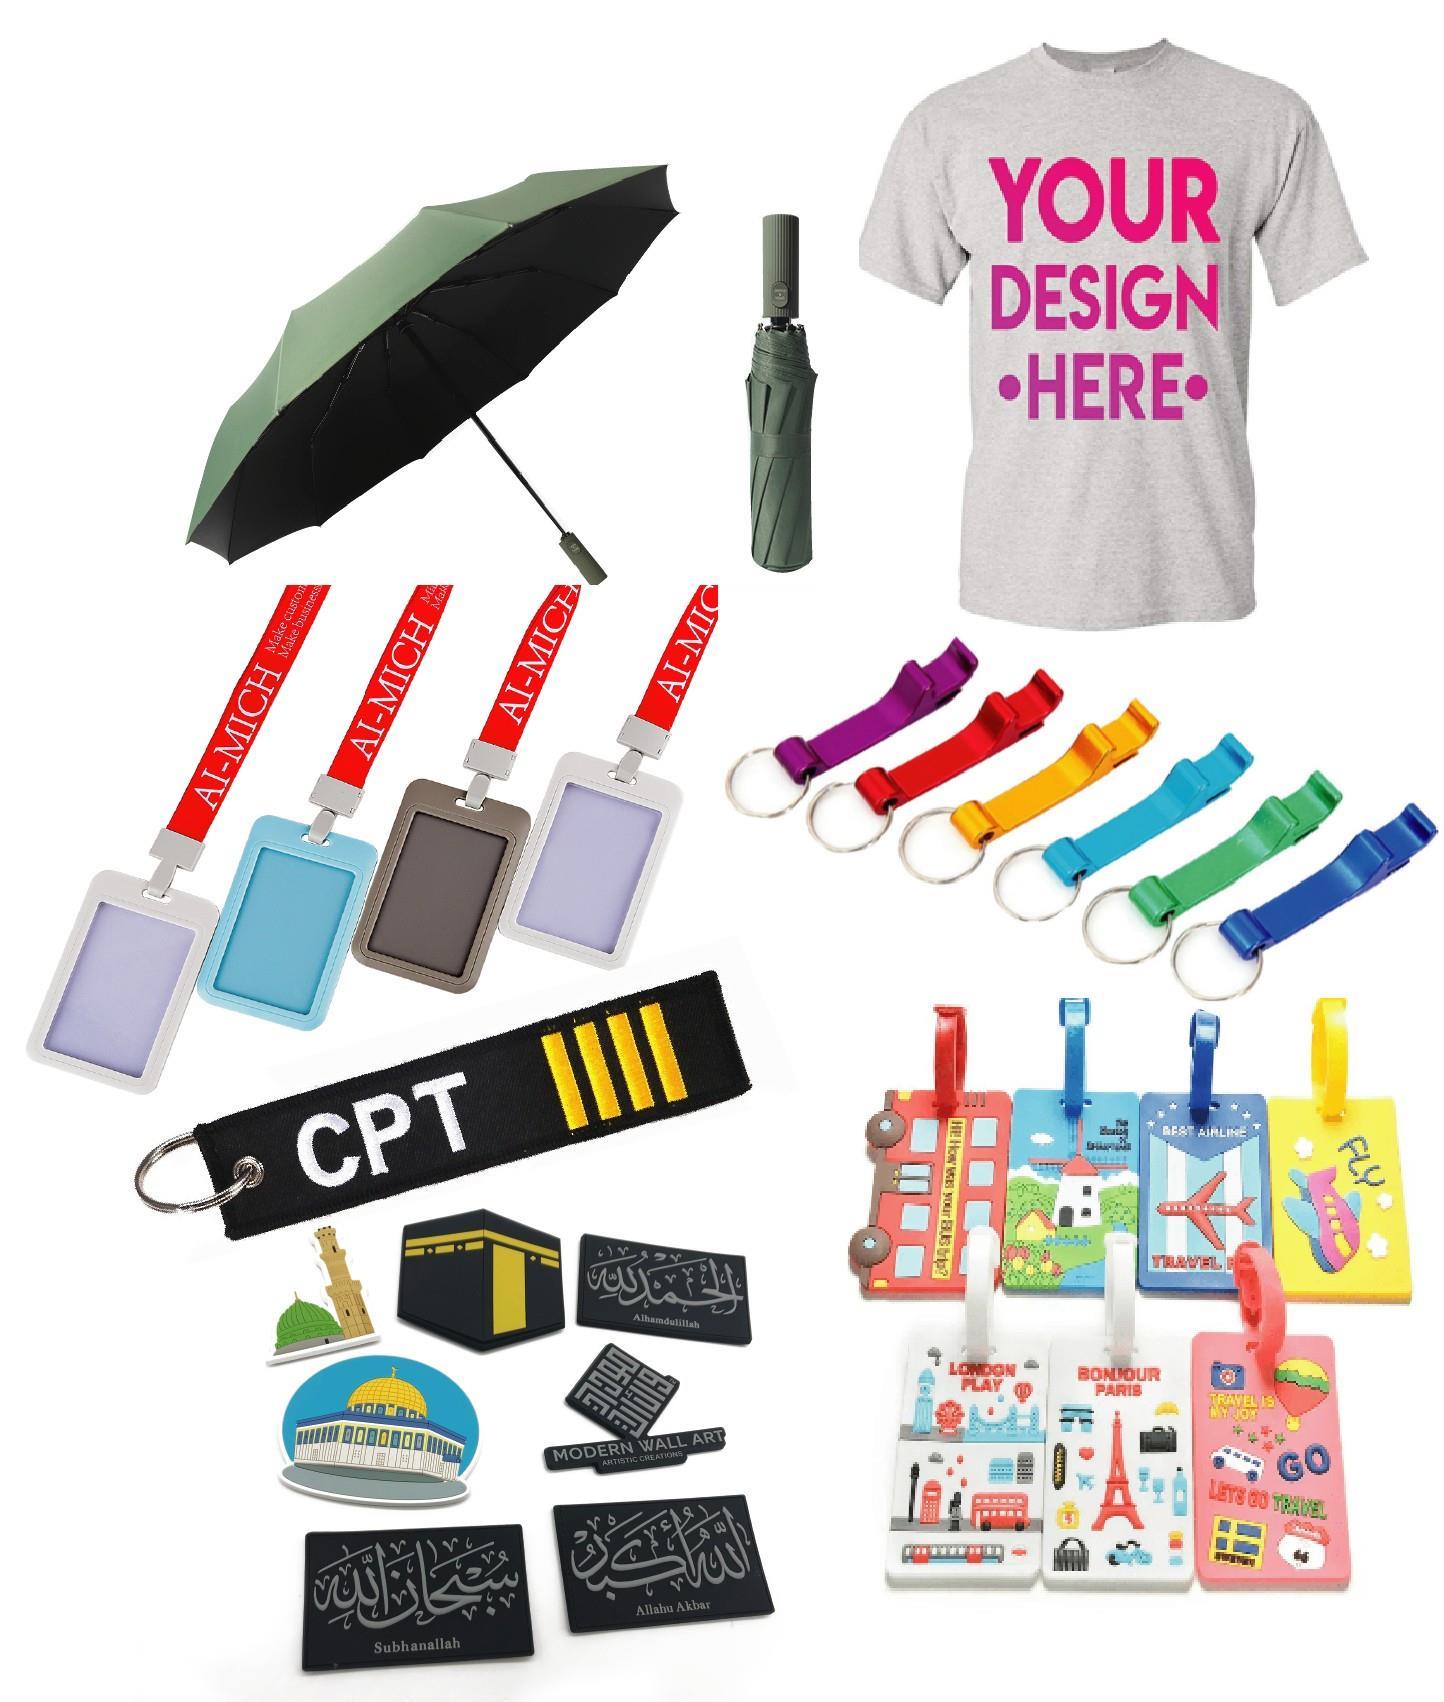 Custom lanyard Cap Pen gift set Company exhibition Christmas